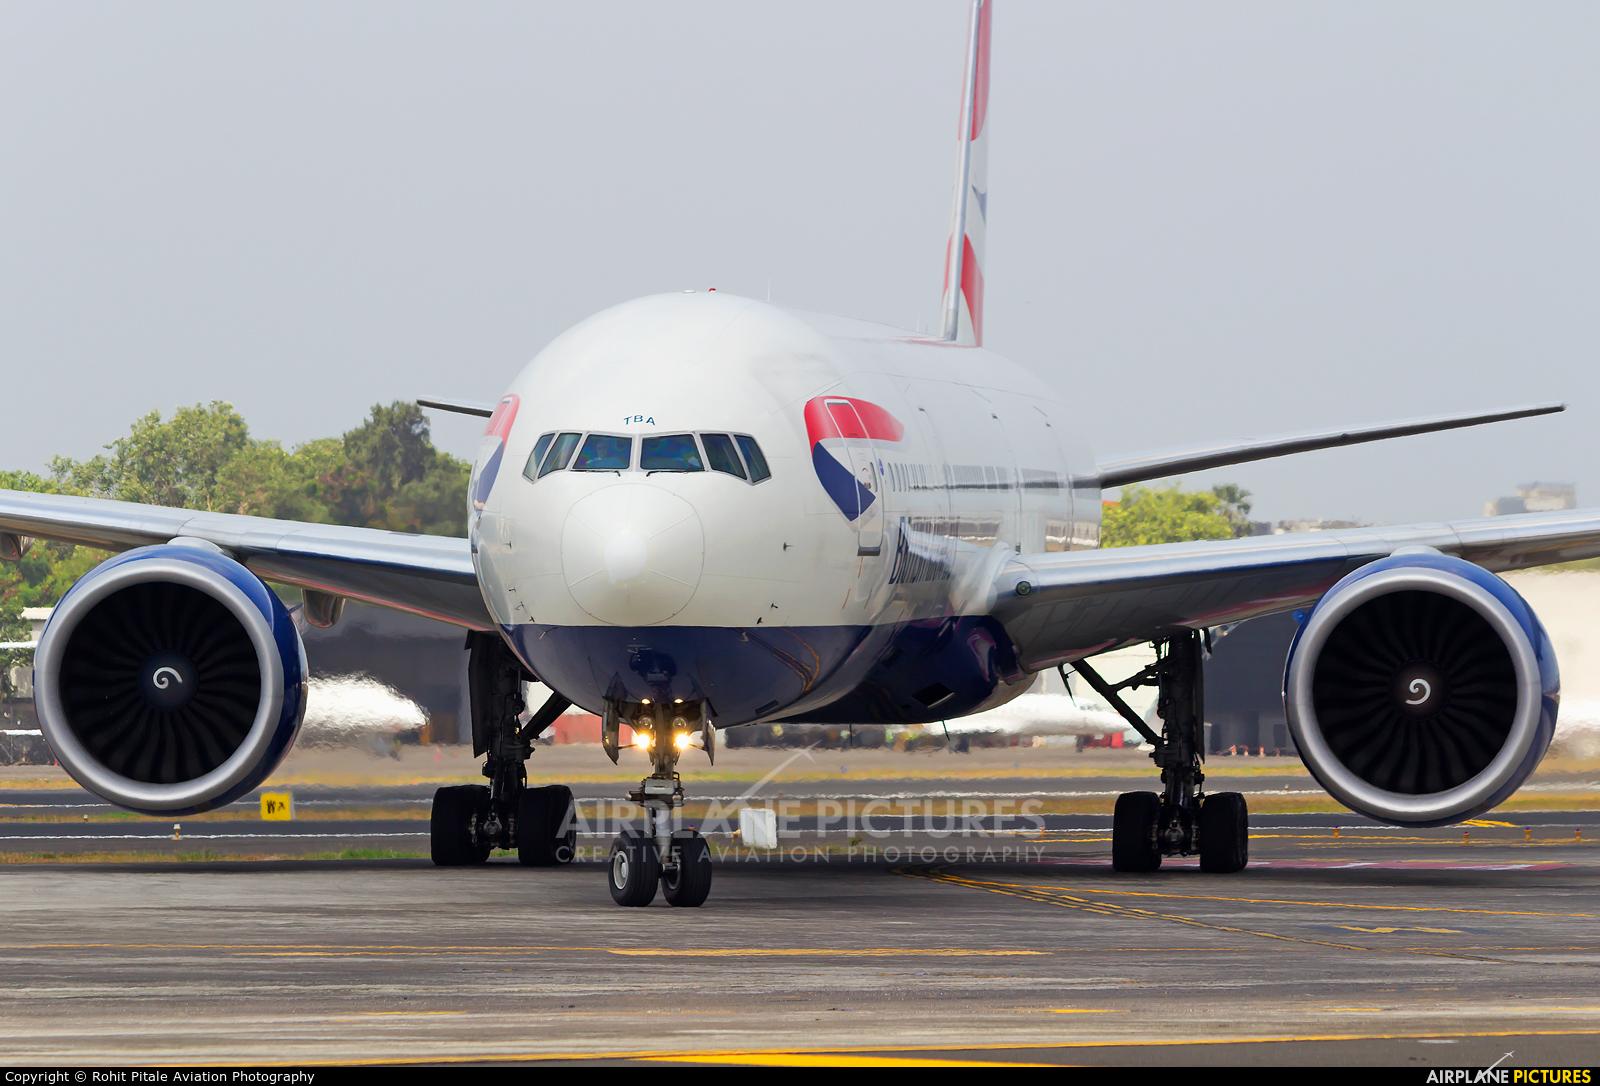 British Airways G-STBA aircraft at Mumbai - Chhatrapati Shivaji Intl